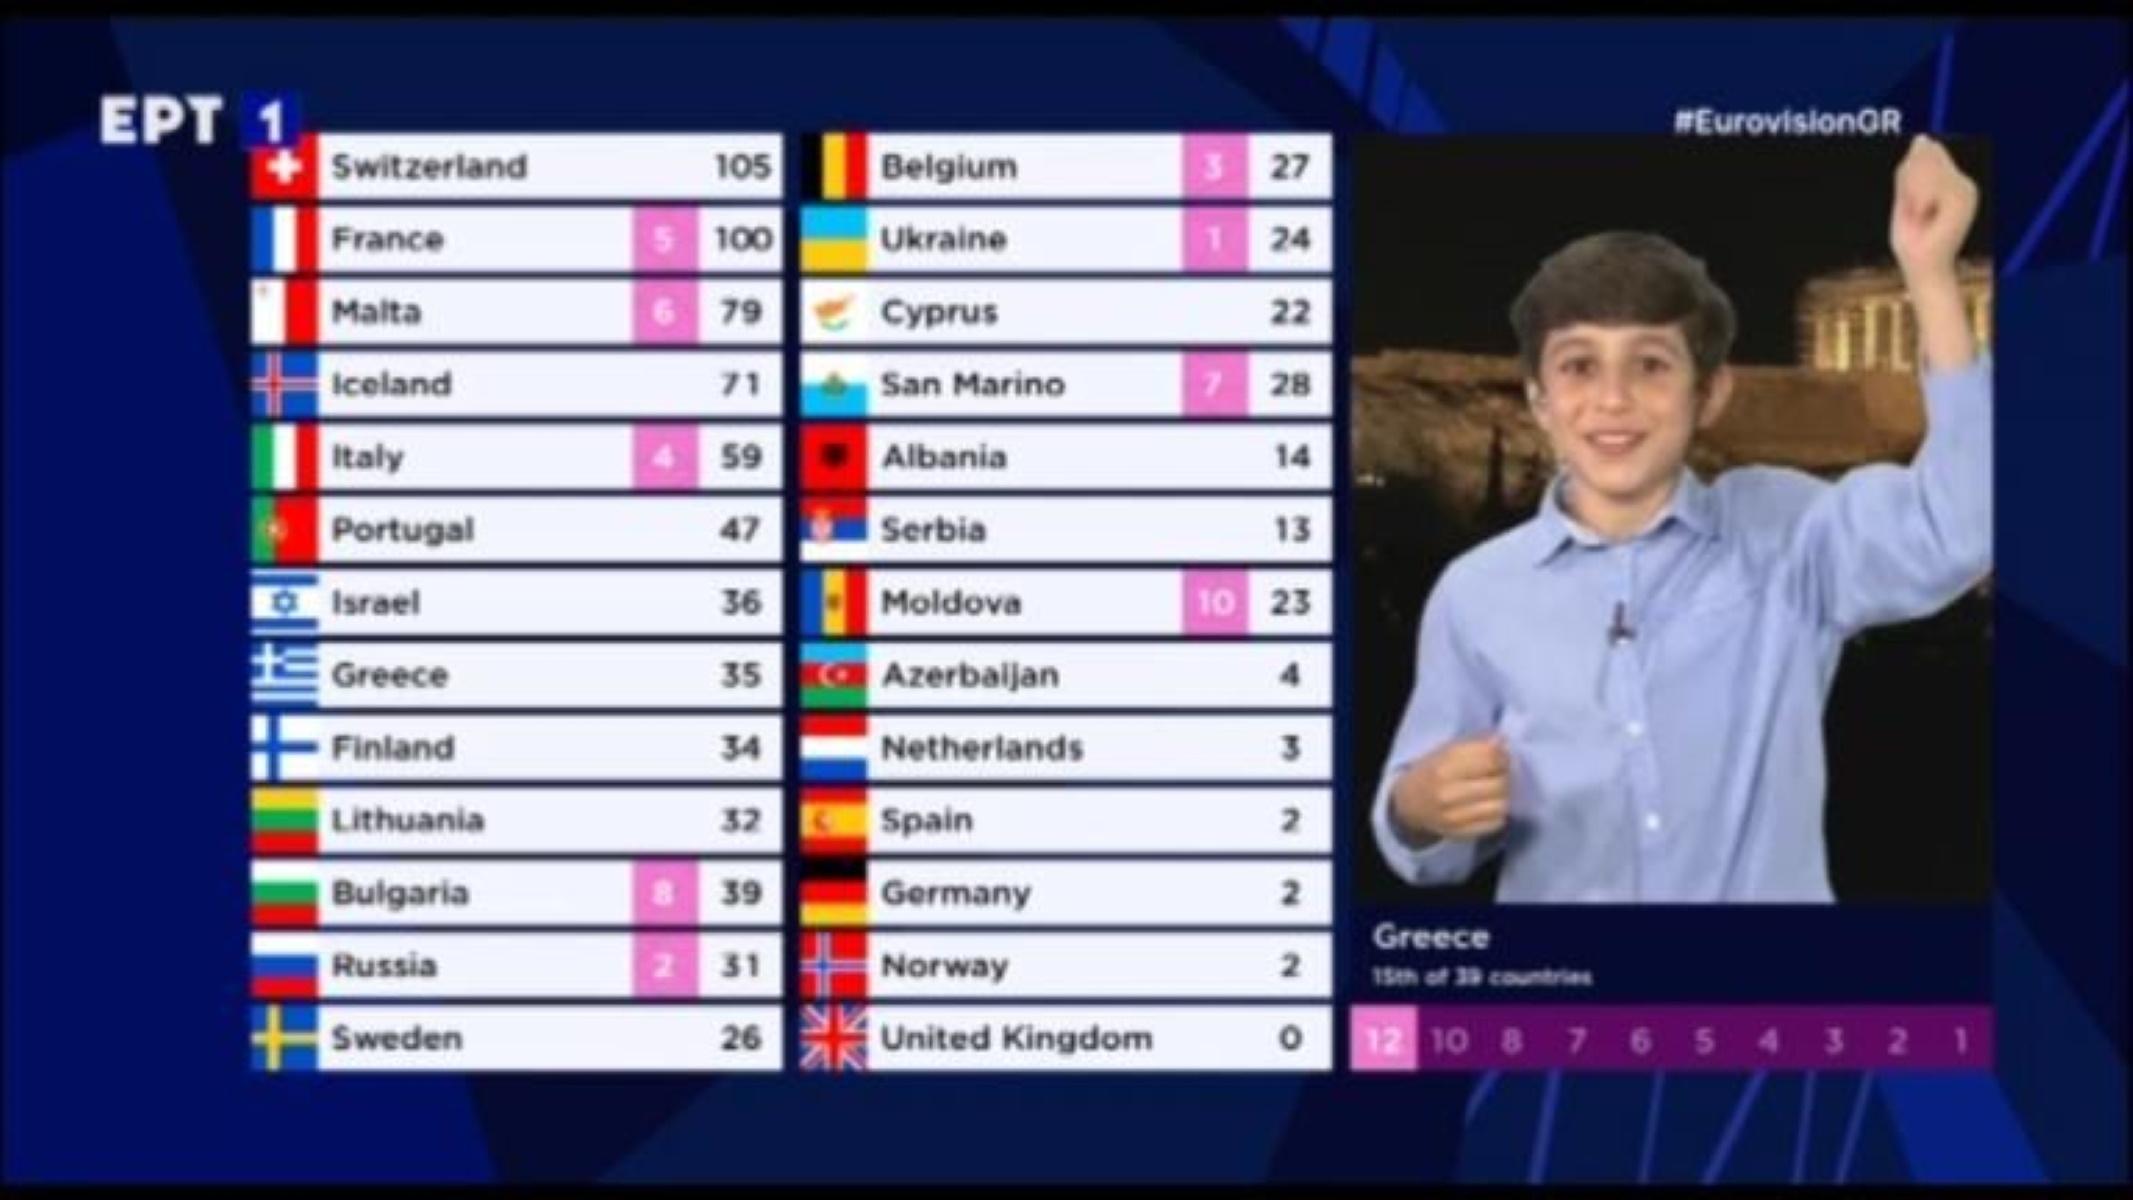 Eurovision 2021: Ο Μανώλης Γκίνης αιφνιδίασε την EBU και έδωσε ρεκόρ στην Ελλάδα